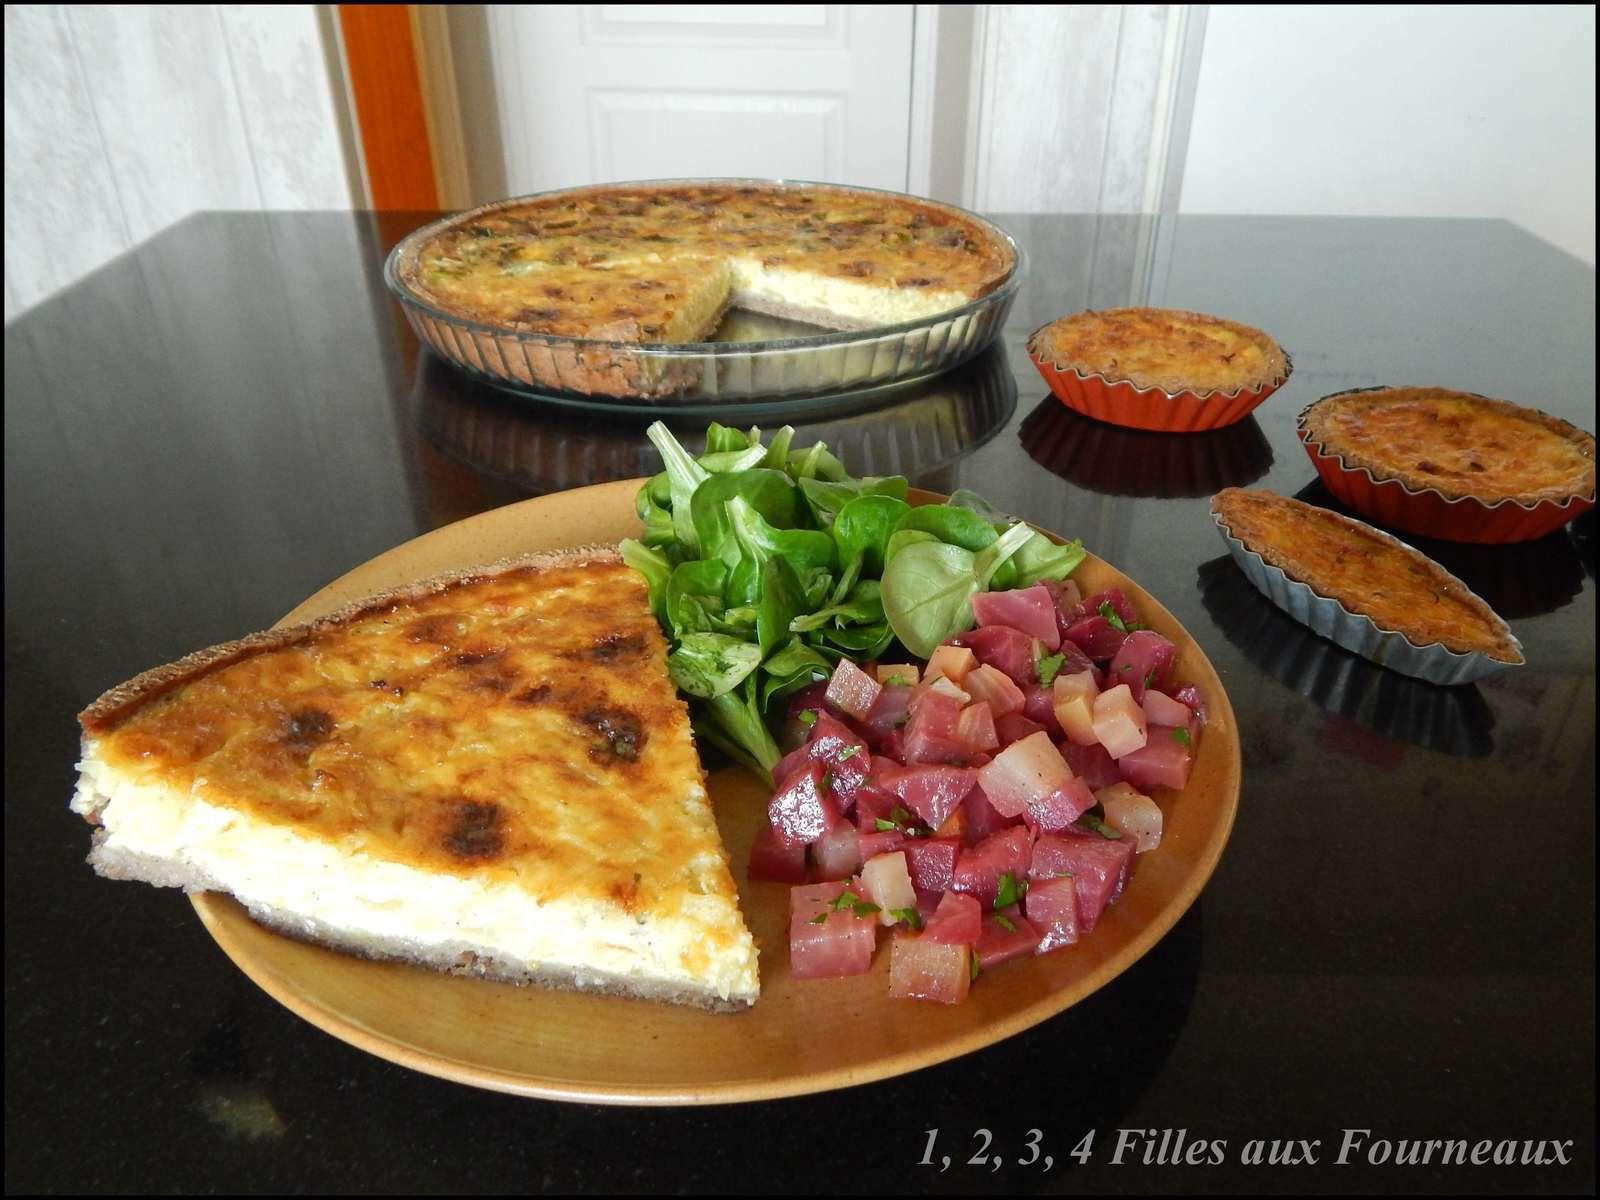 tarte betterave fourme d'ambert, tarte betterave roquefort, tarte betterave bleu, quiche betterave fromage